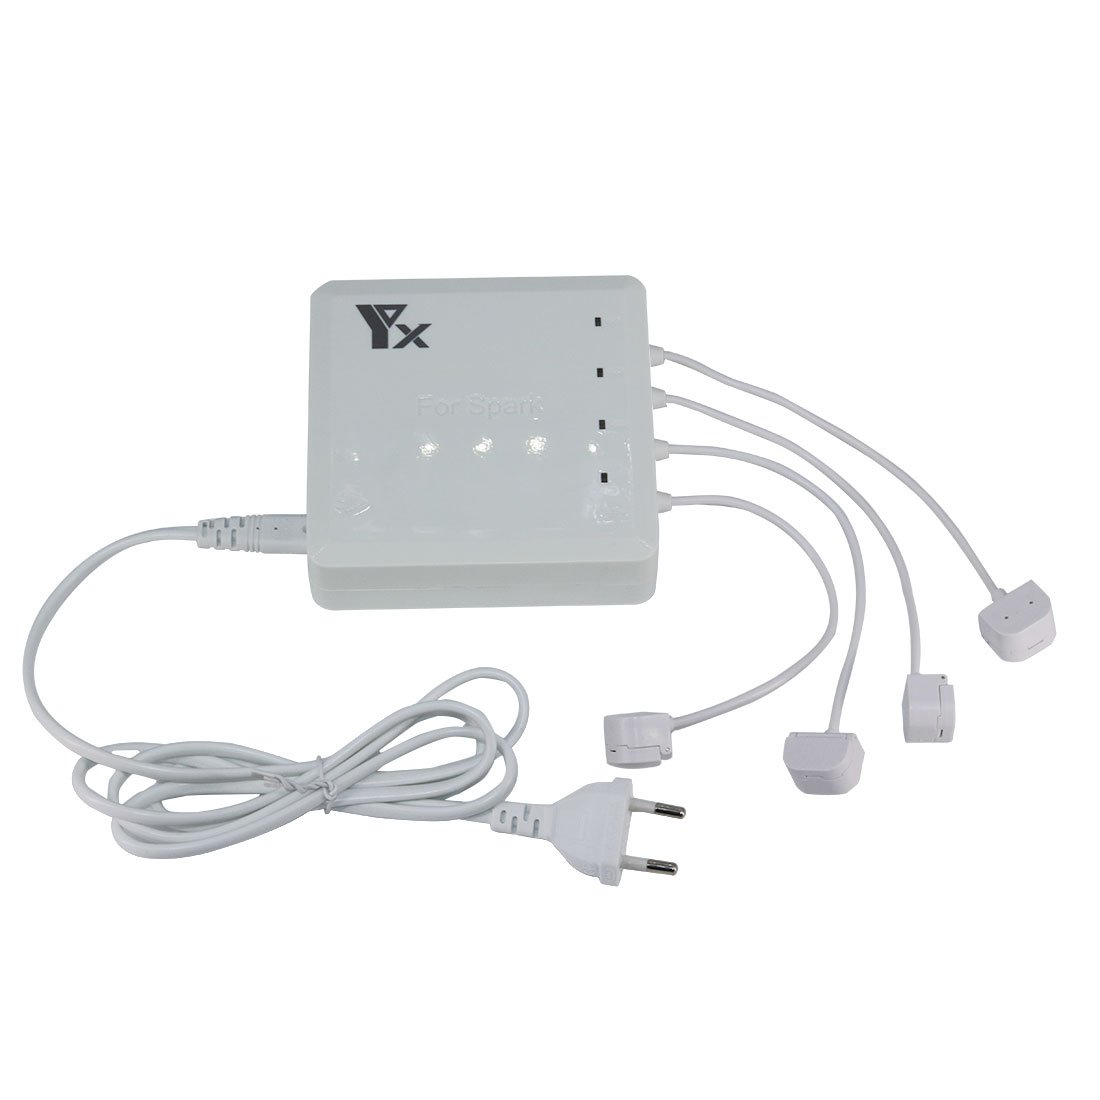 Foxom 6 in 1 Rapido Caricabatterie Intelligente Charging Hub Per DJI Spark Drone Battery, Telecomando e telefoni